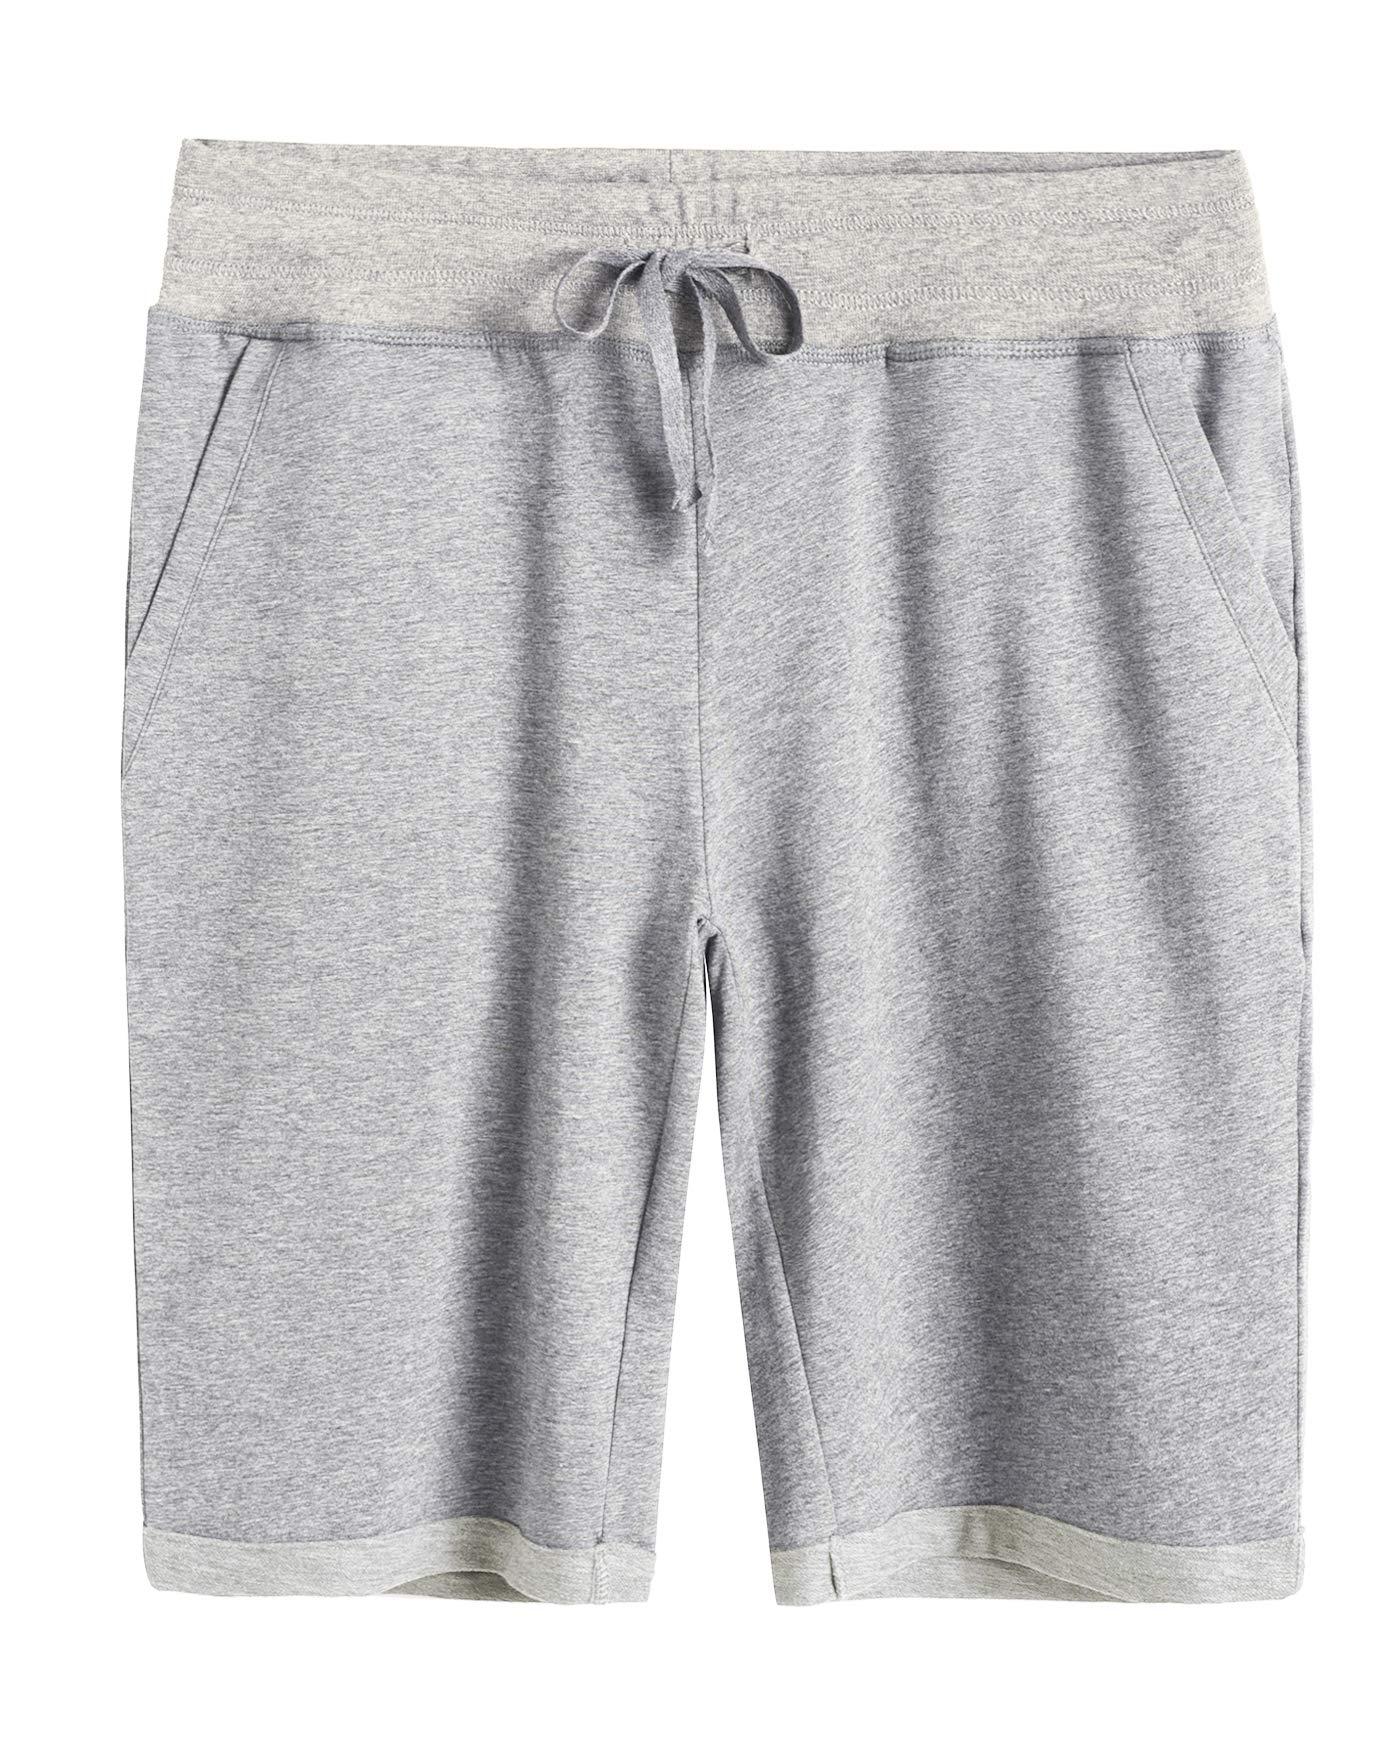 Weintee Women's Cotton Bermuda Shorts with Pockets 3X Oxford Gray by Weintee